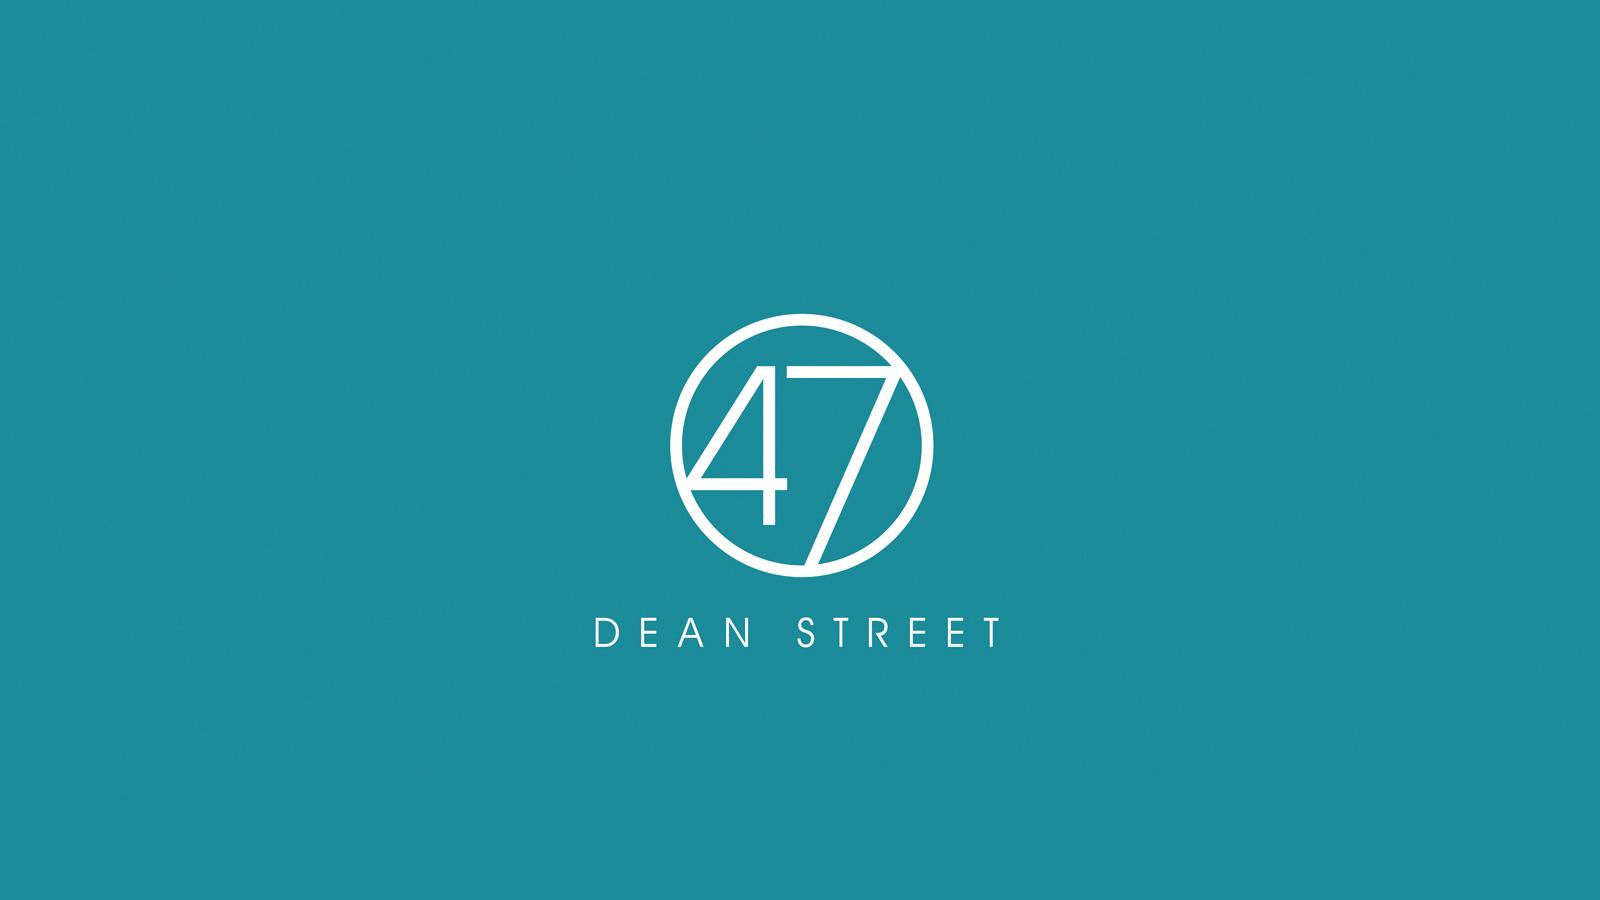 47 Dean Street brand identity